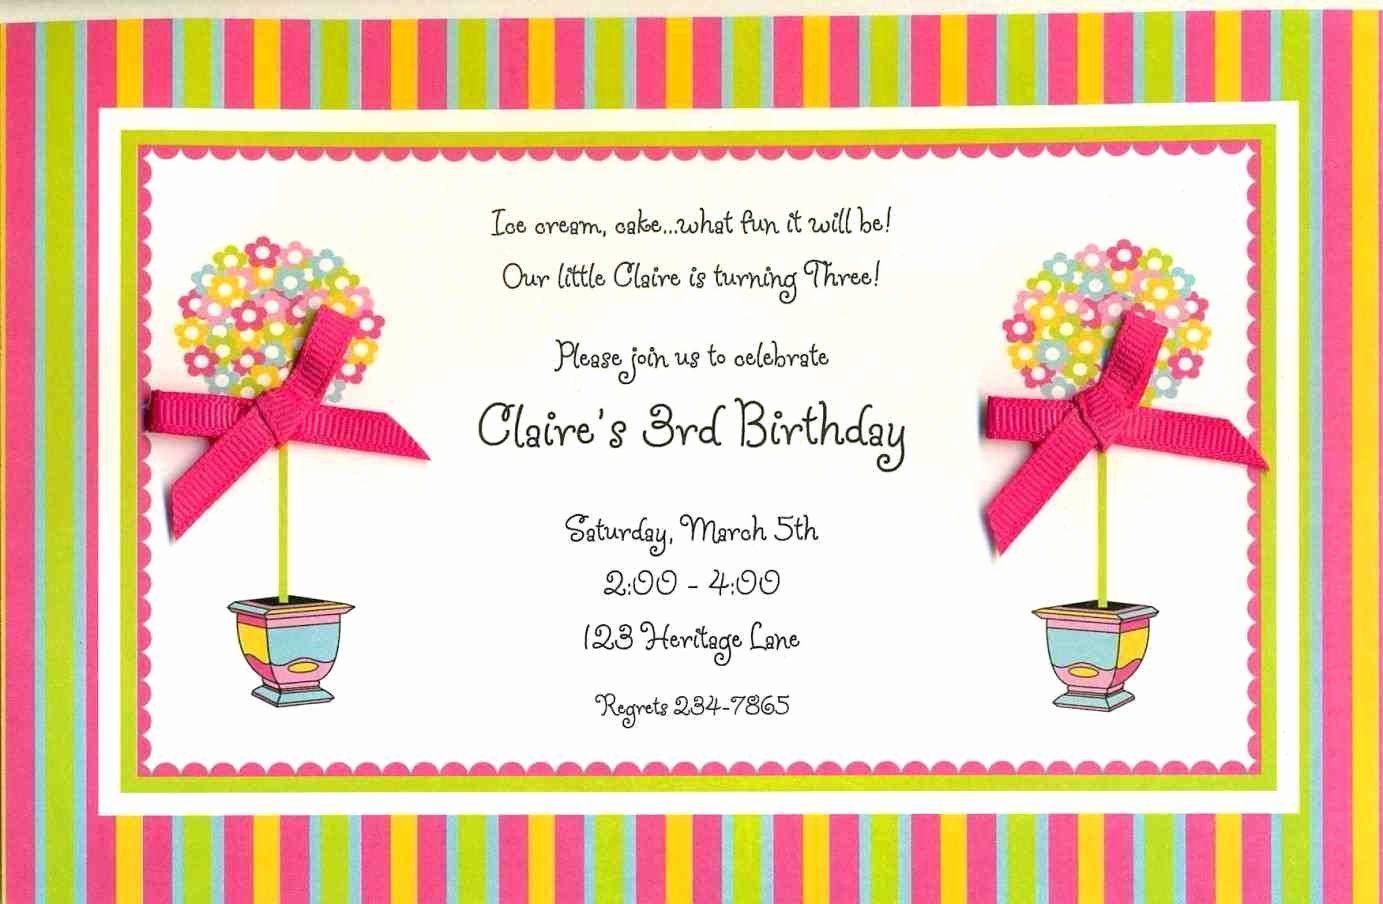 Sample Birthday Party Invitation Wording New 5th Birthday